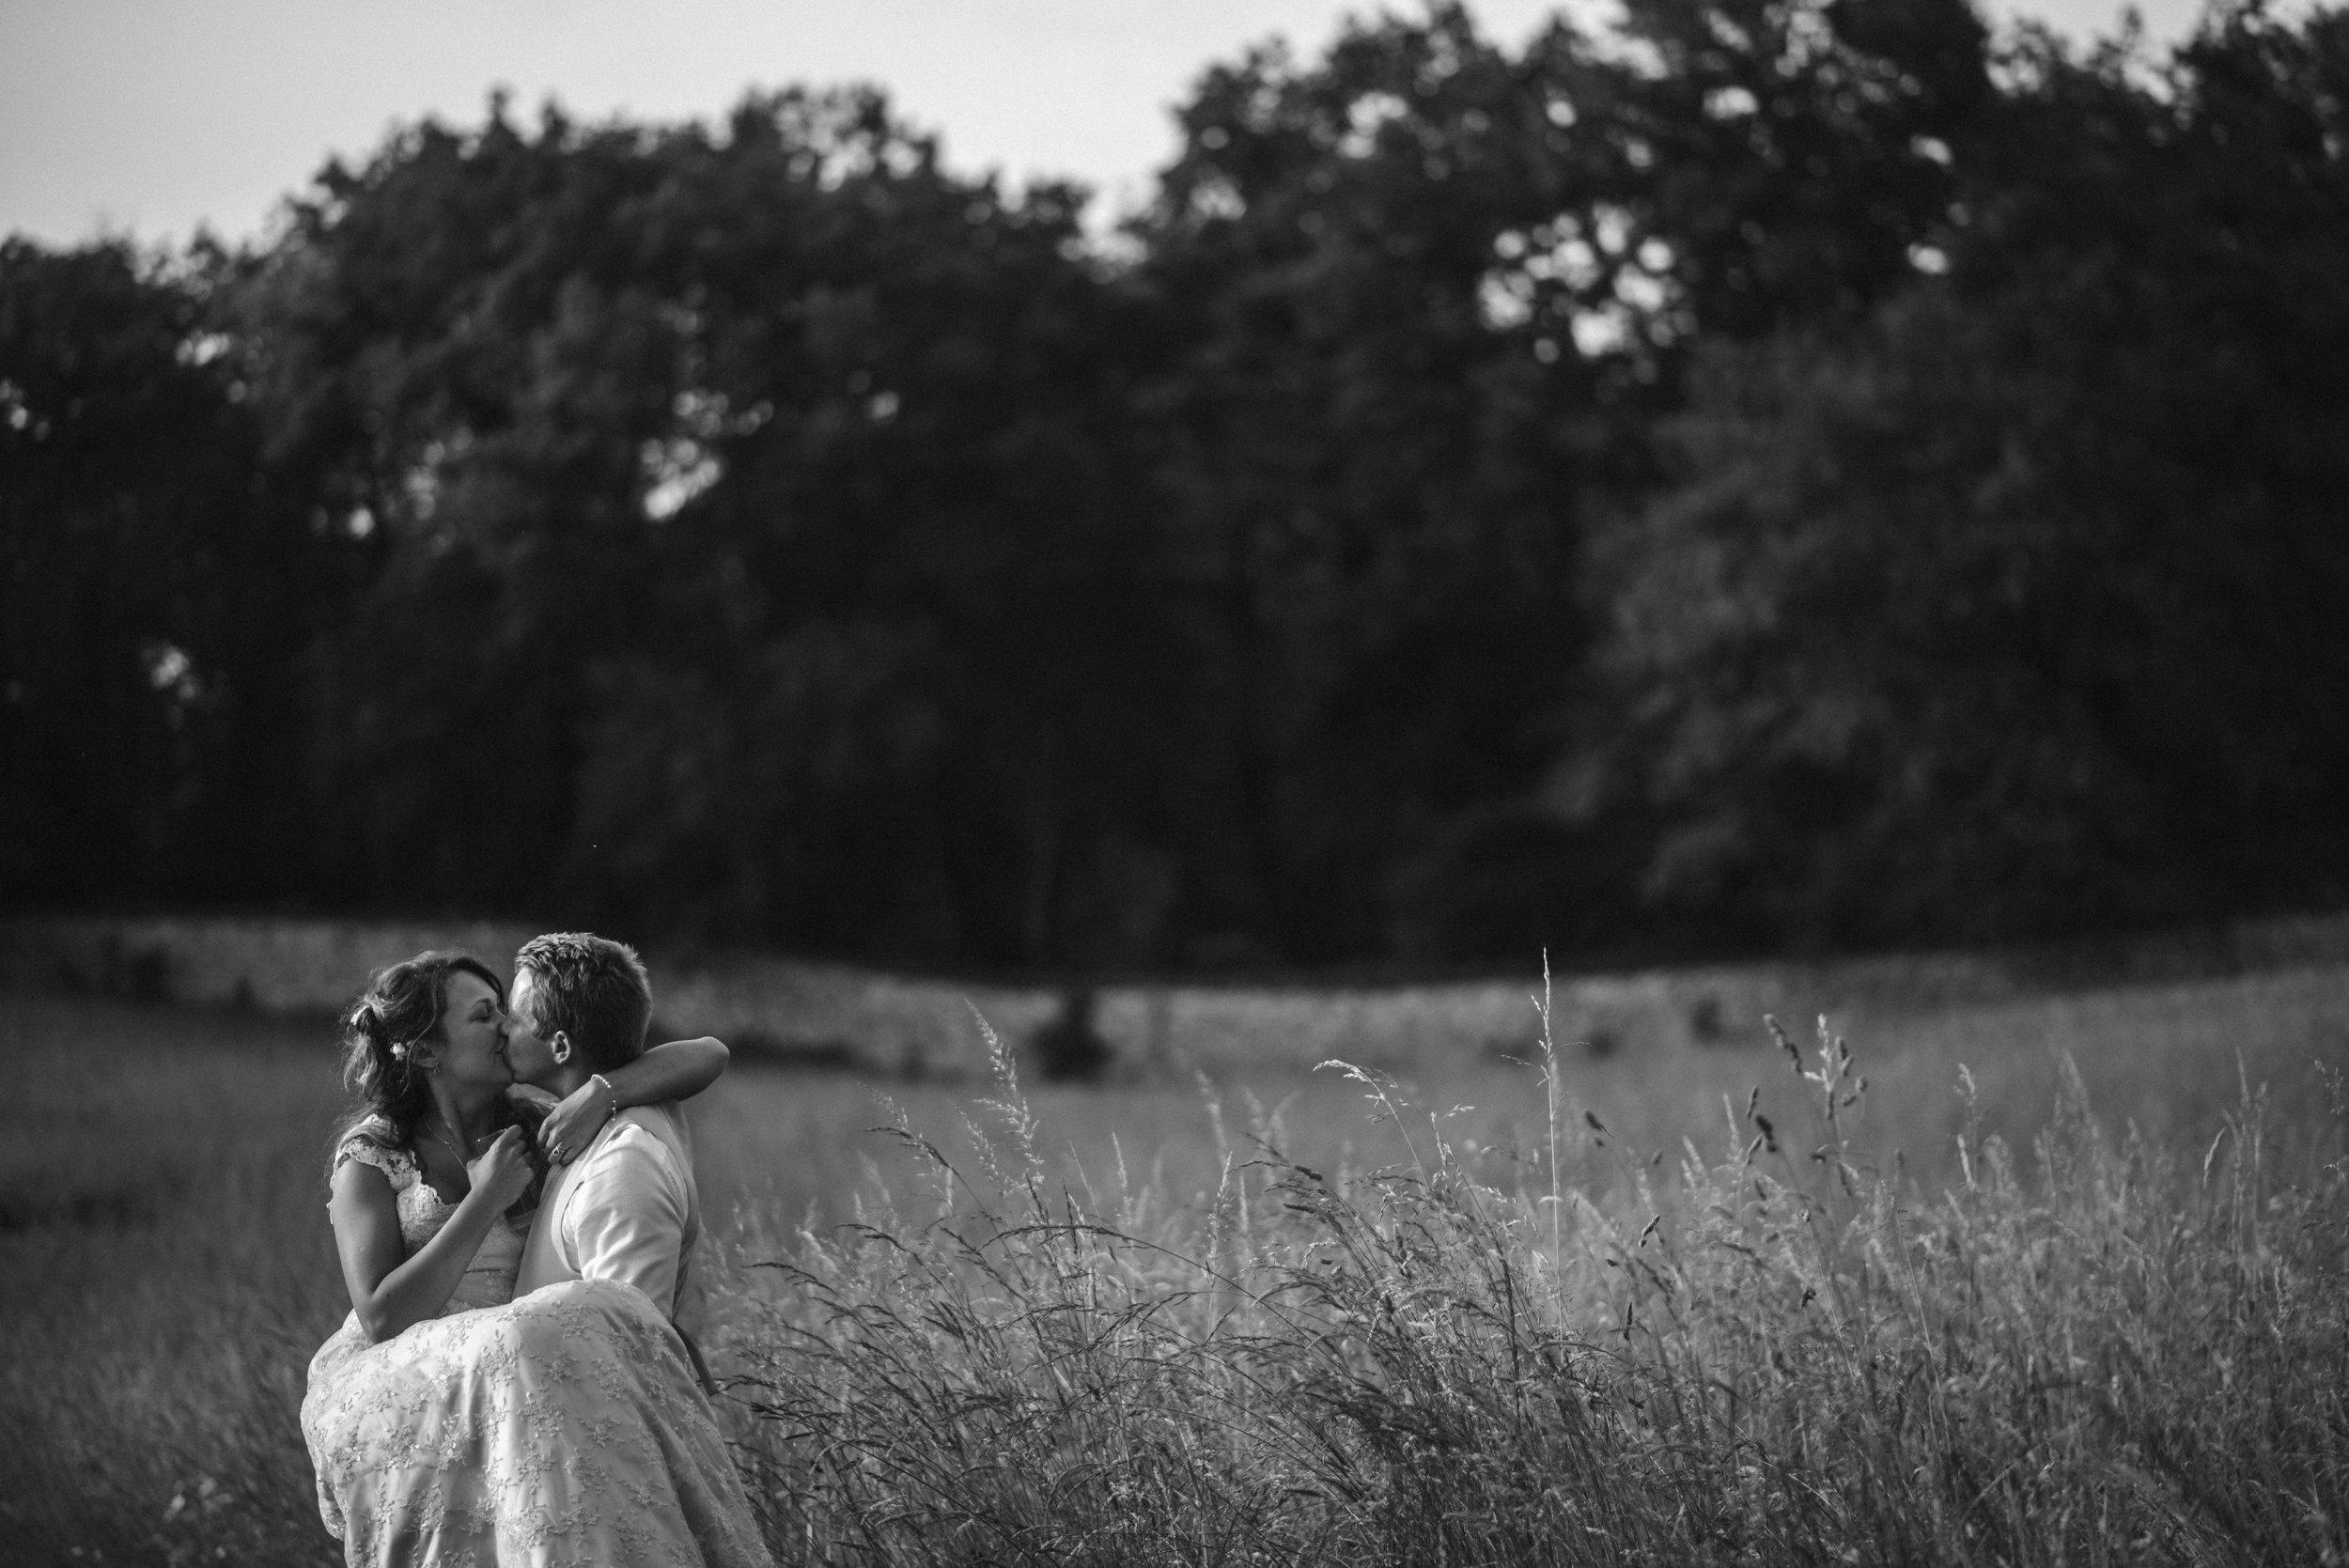 wedding-photographer-dordogne-mark-shaw-60.jpg